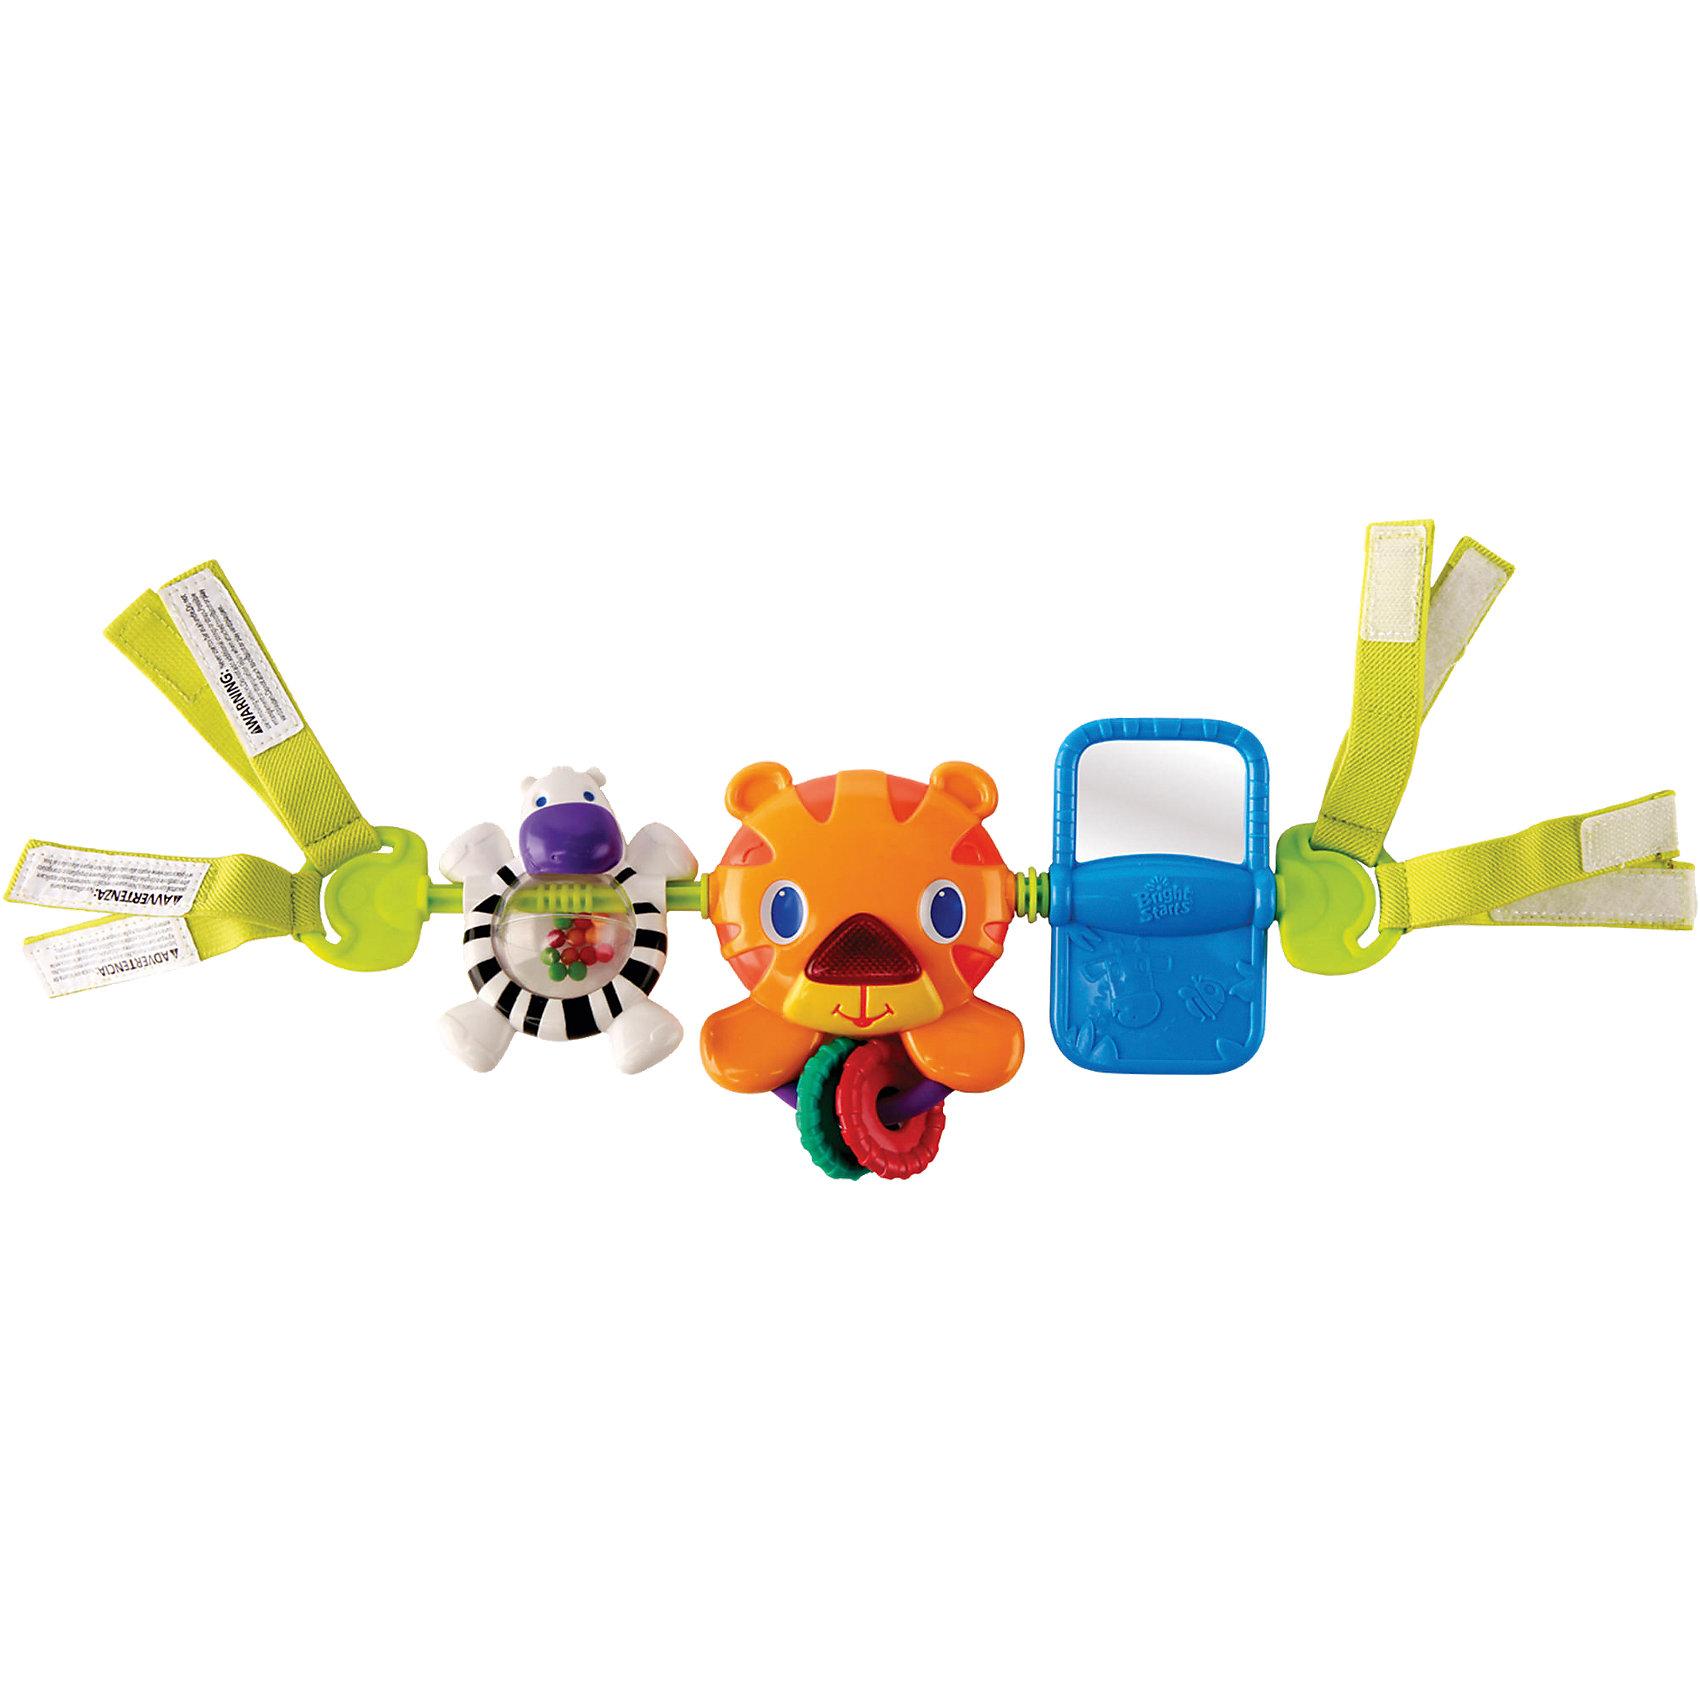 Bright Starts Развивающая игрушка для коляски Тигренок Bright Starts игрушка подвеска bright starts развивающая игрушка щенок